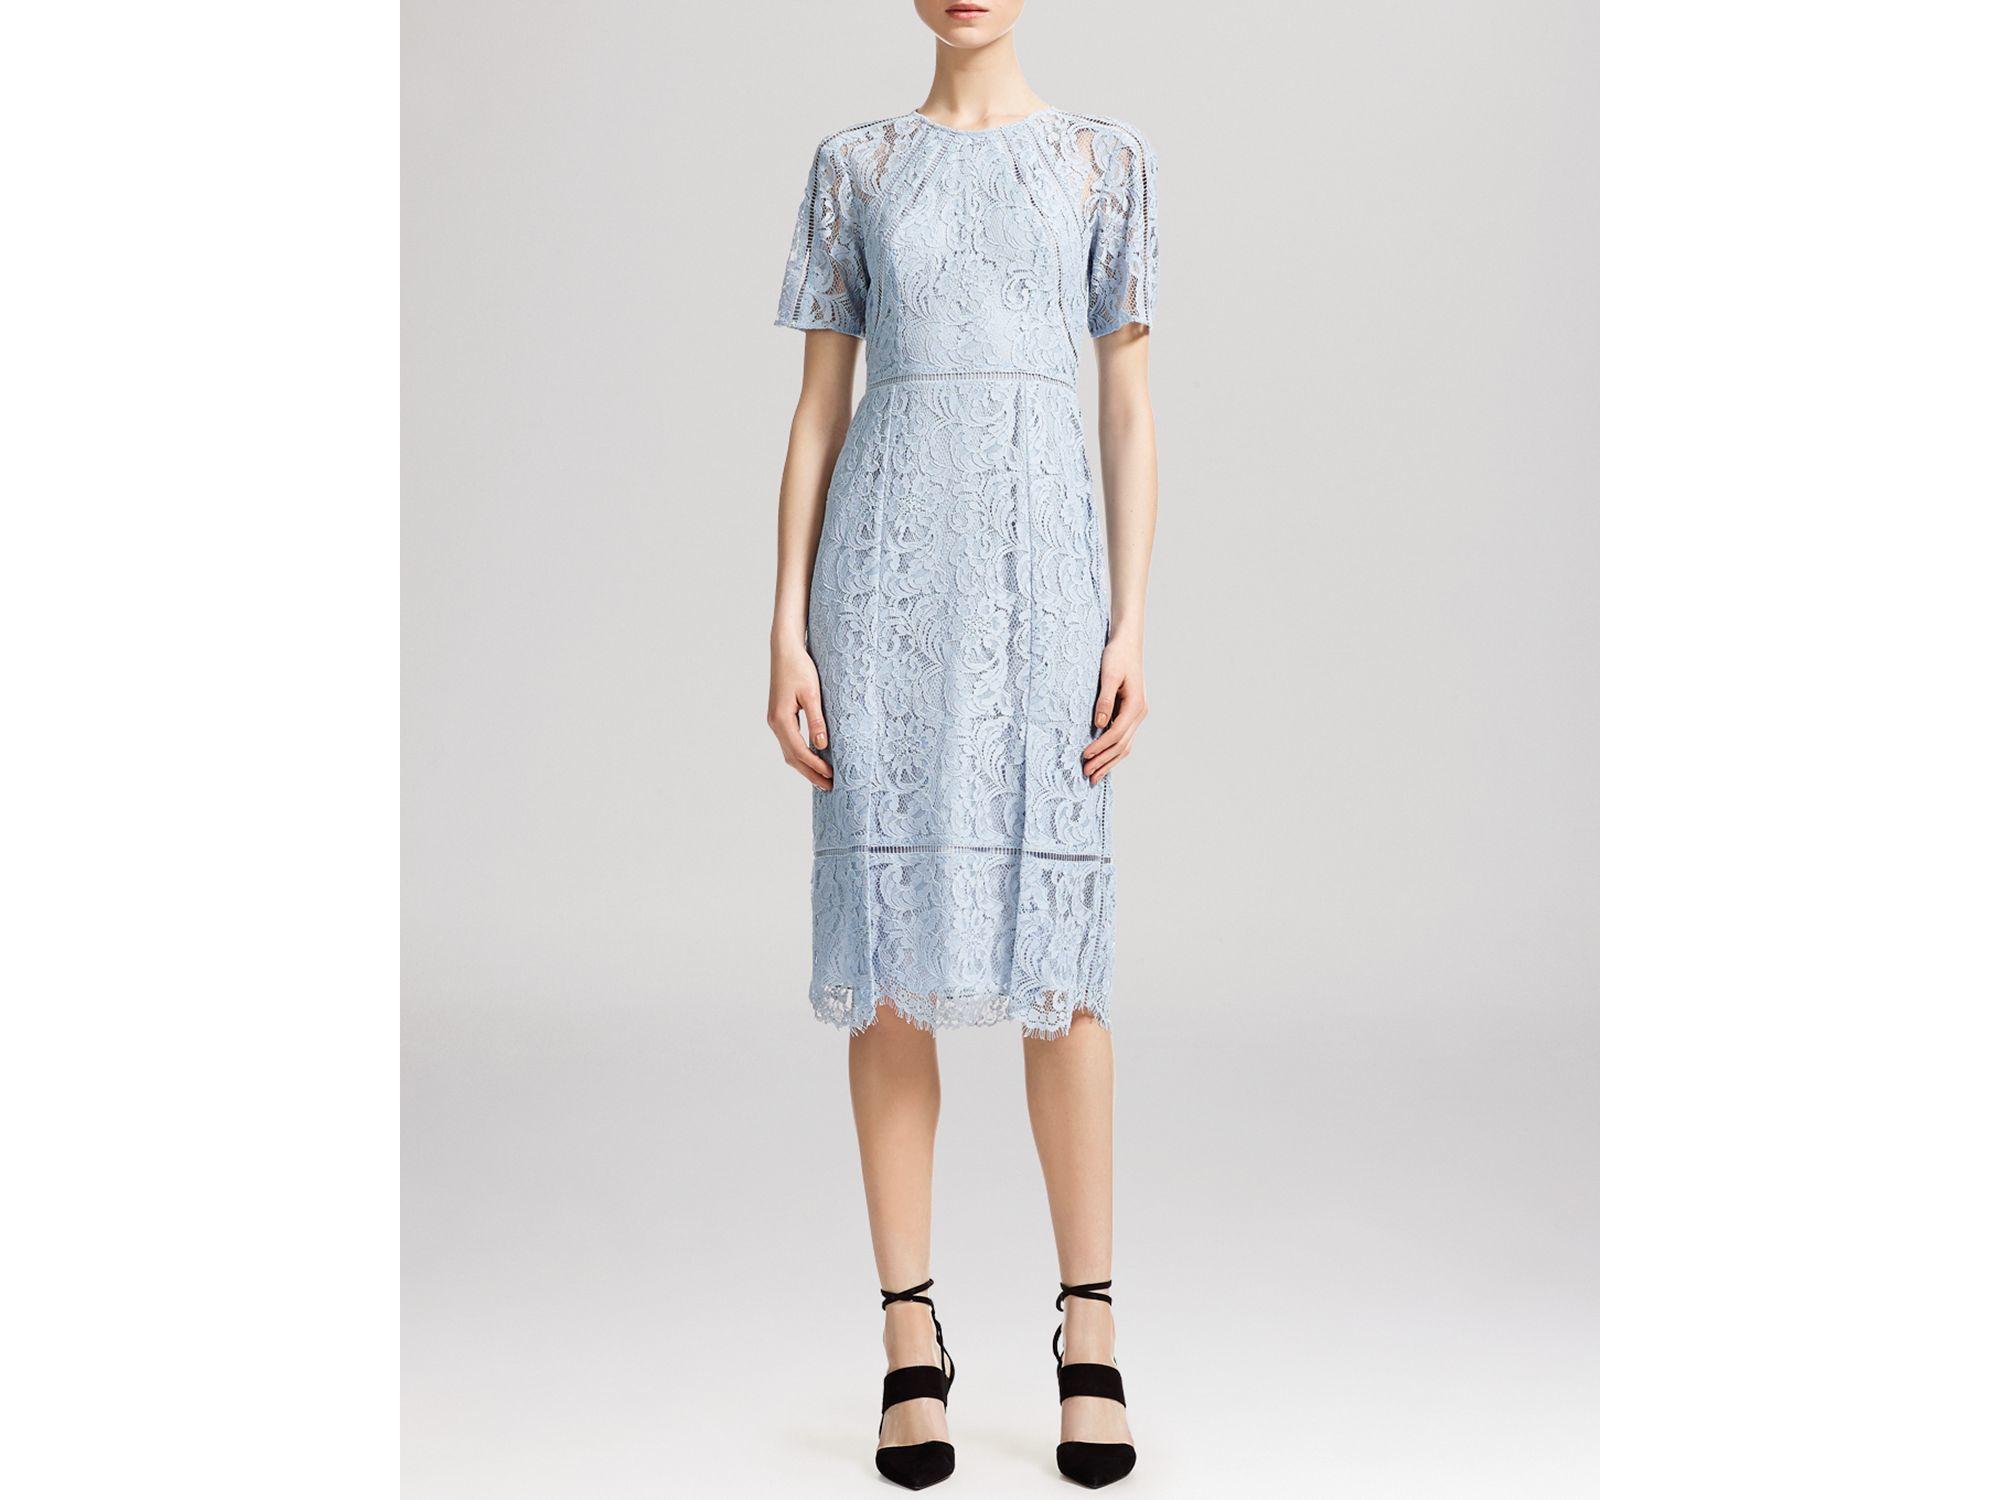 Whistles Pale Blue Lace Dress Dress On Sale